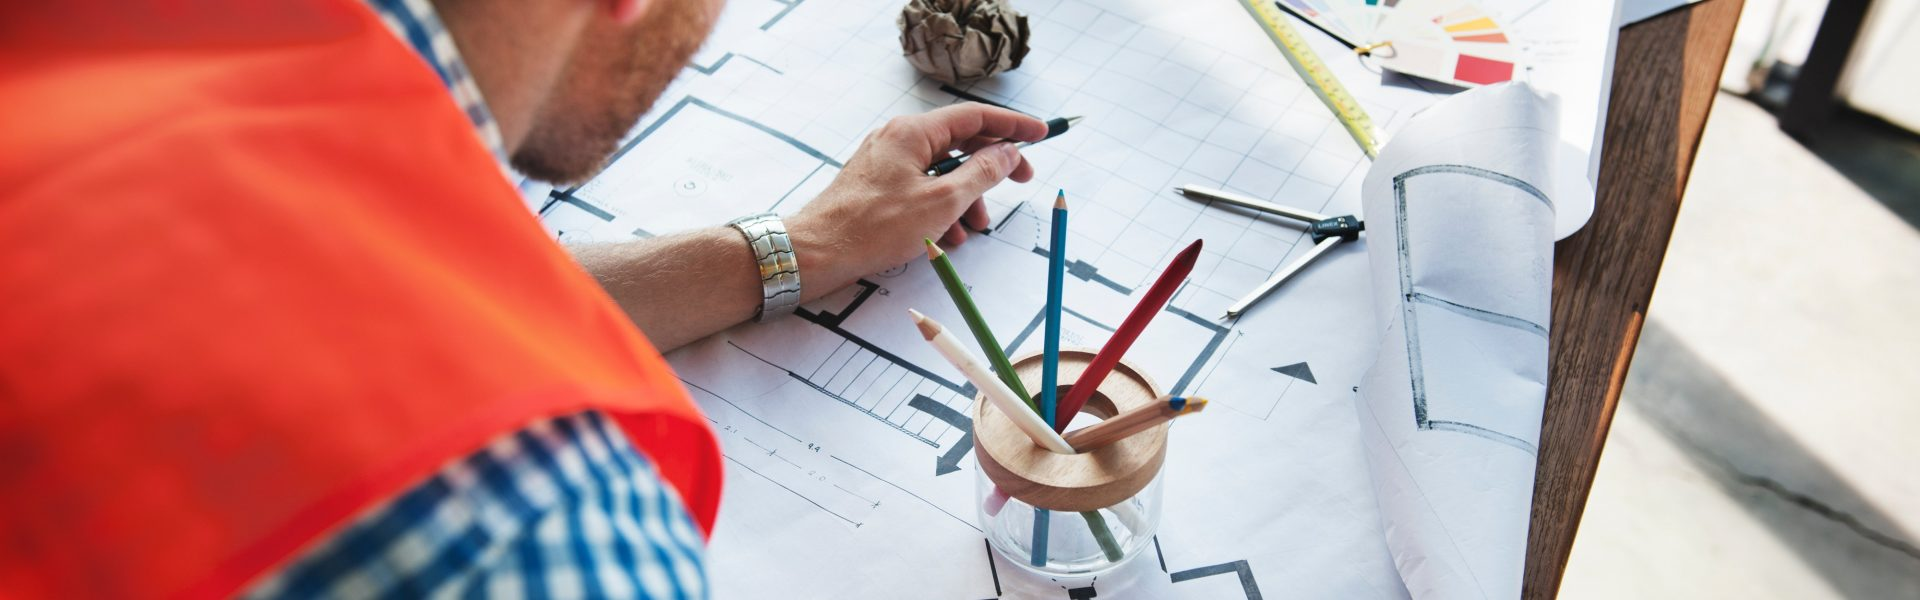 adult-architect-architectural-design-1260309-nxfn7as2gemkqfq